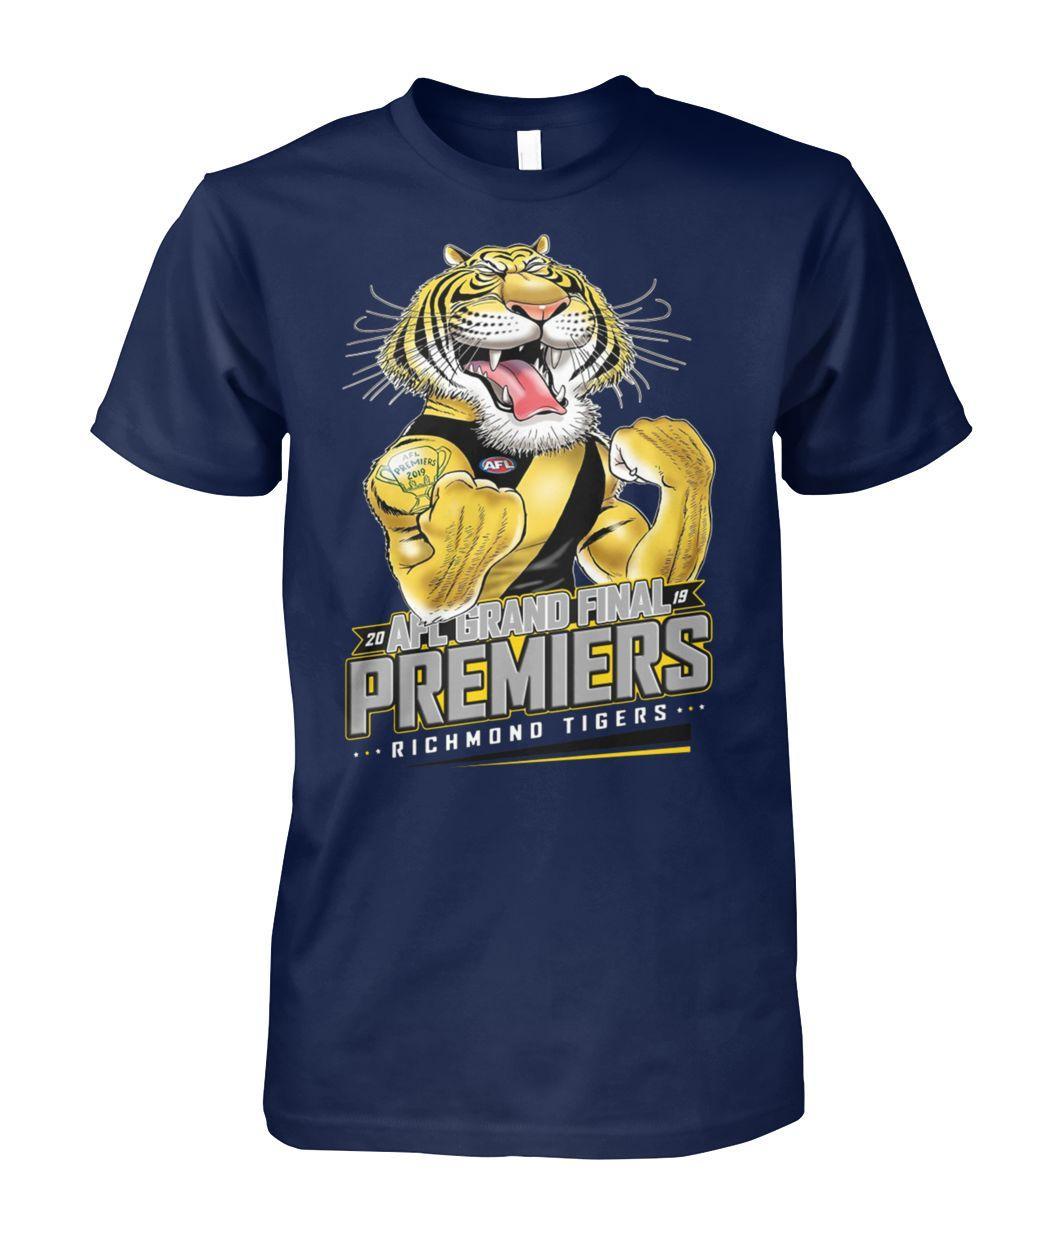 20 AFL grand final premiers richmond tigers unisex cotton tee